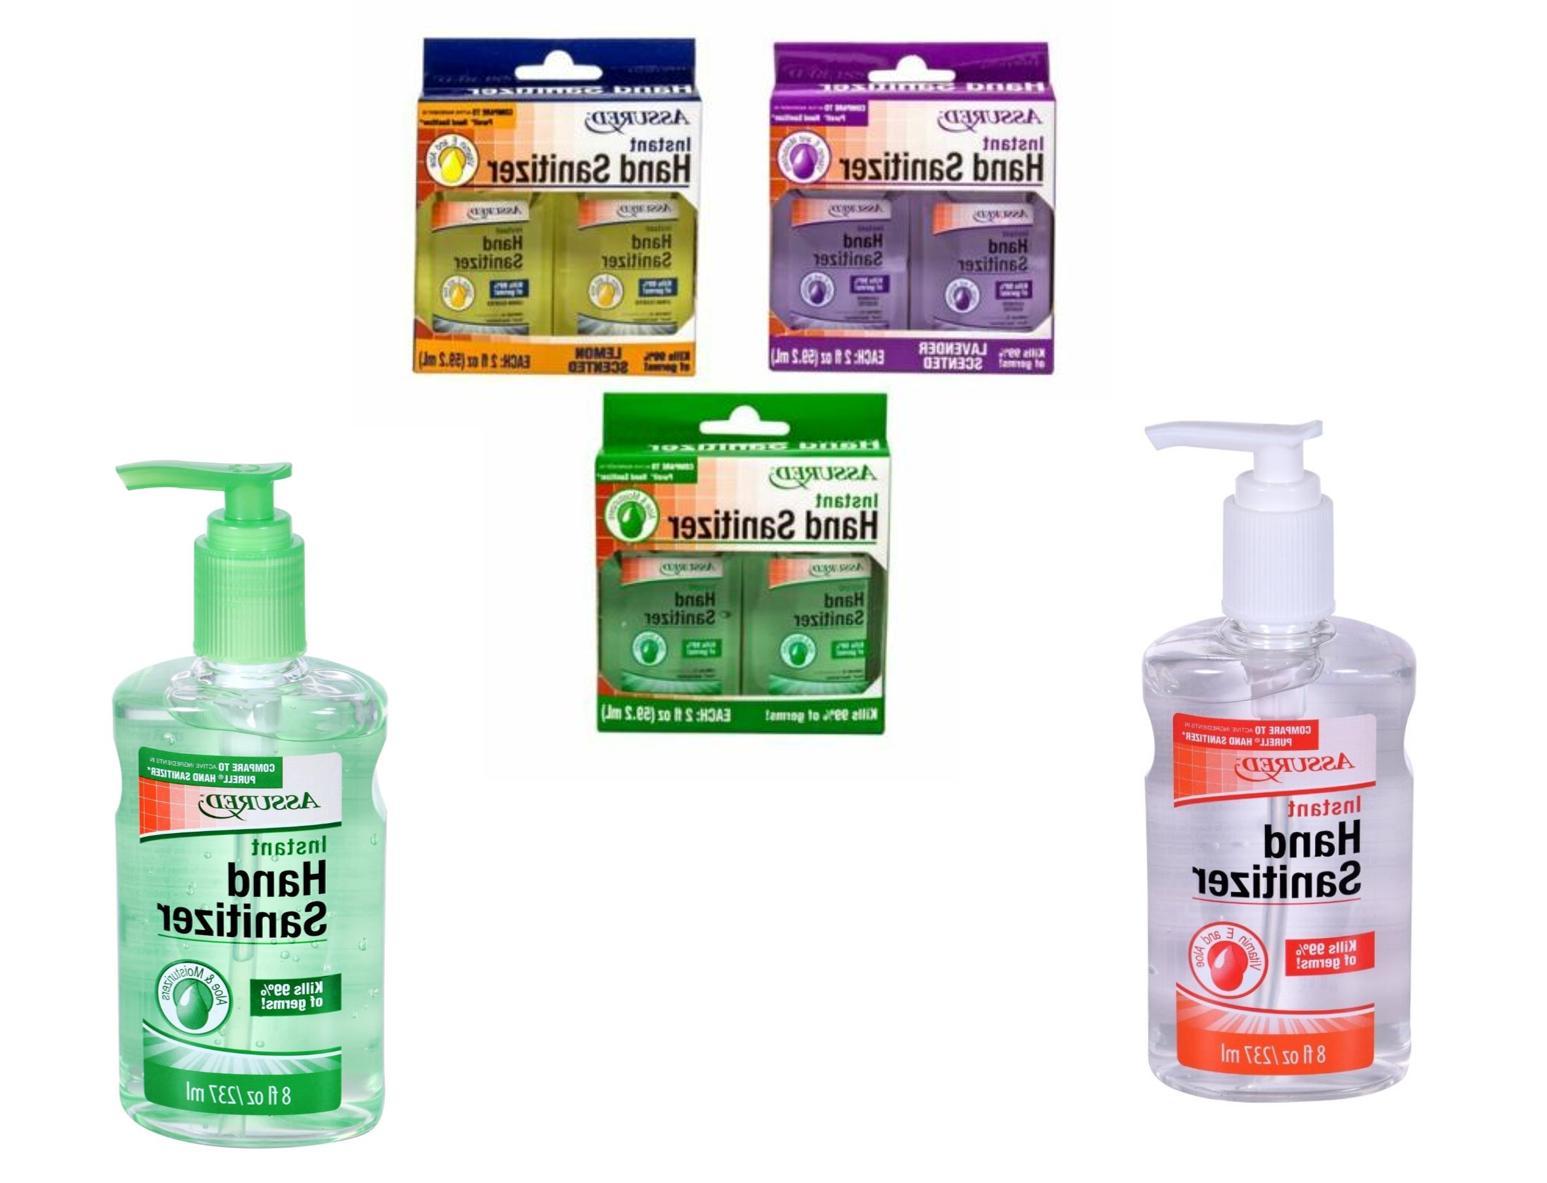 hand sanitizer 70 percent ethyl alcohol